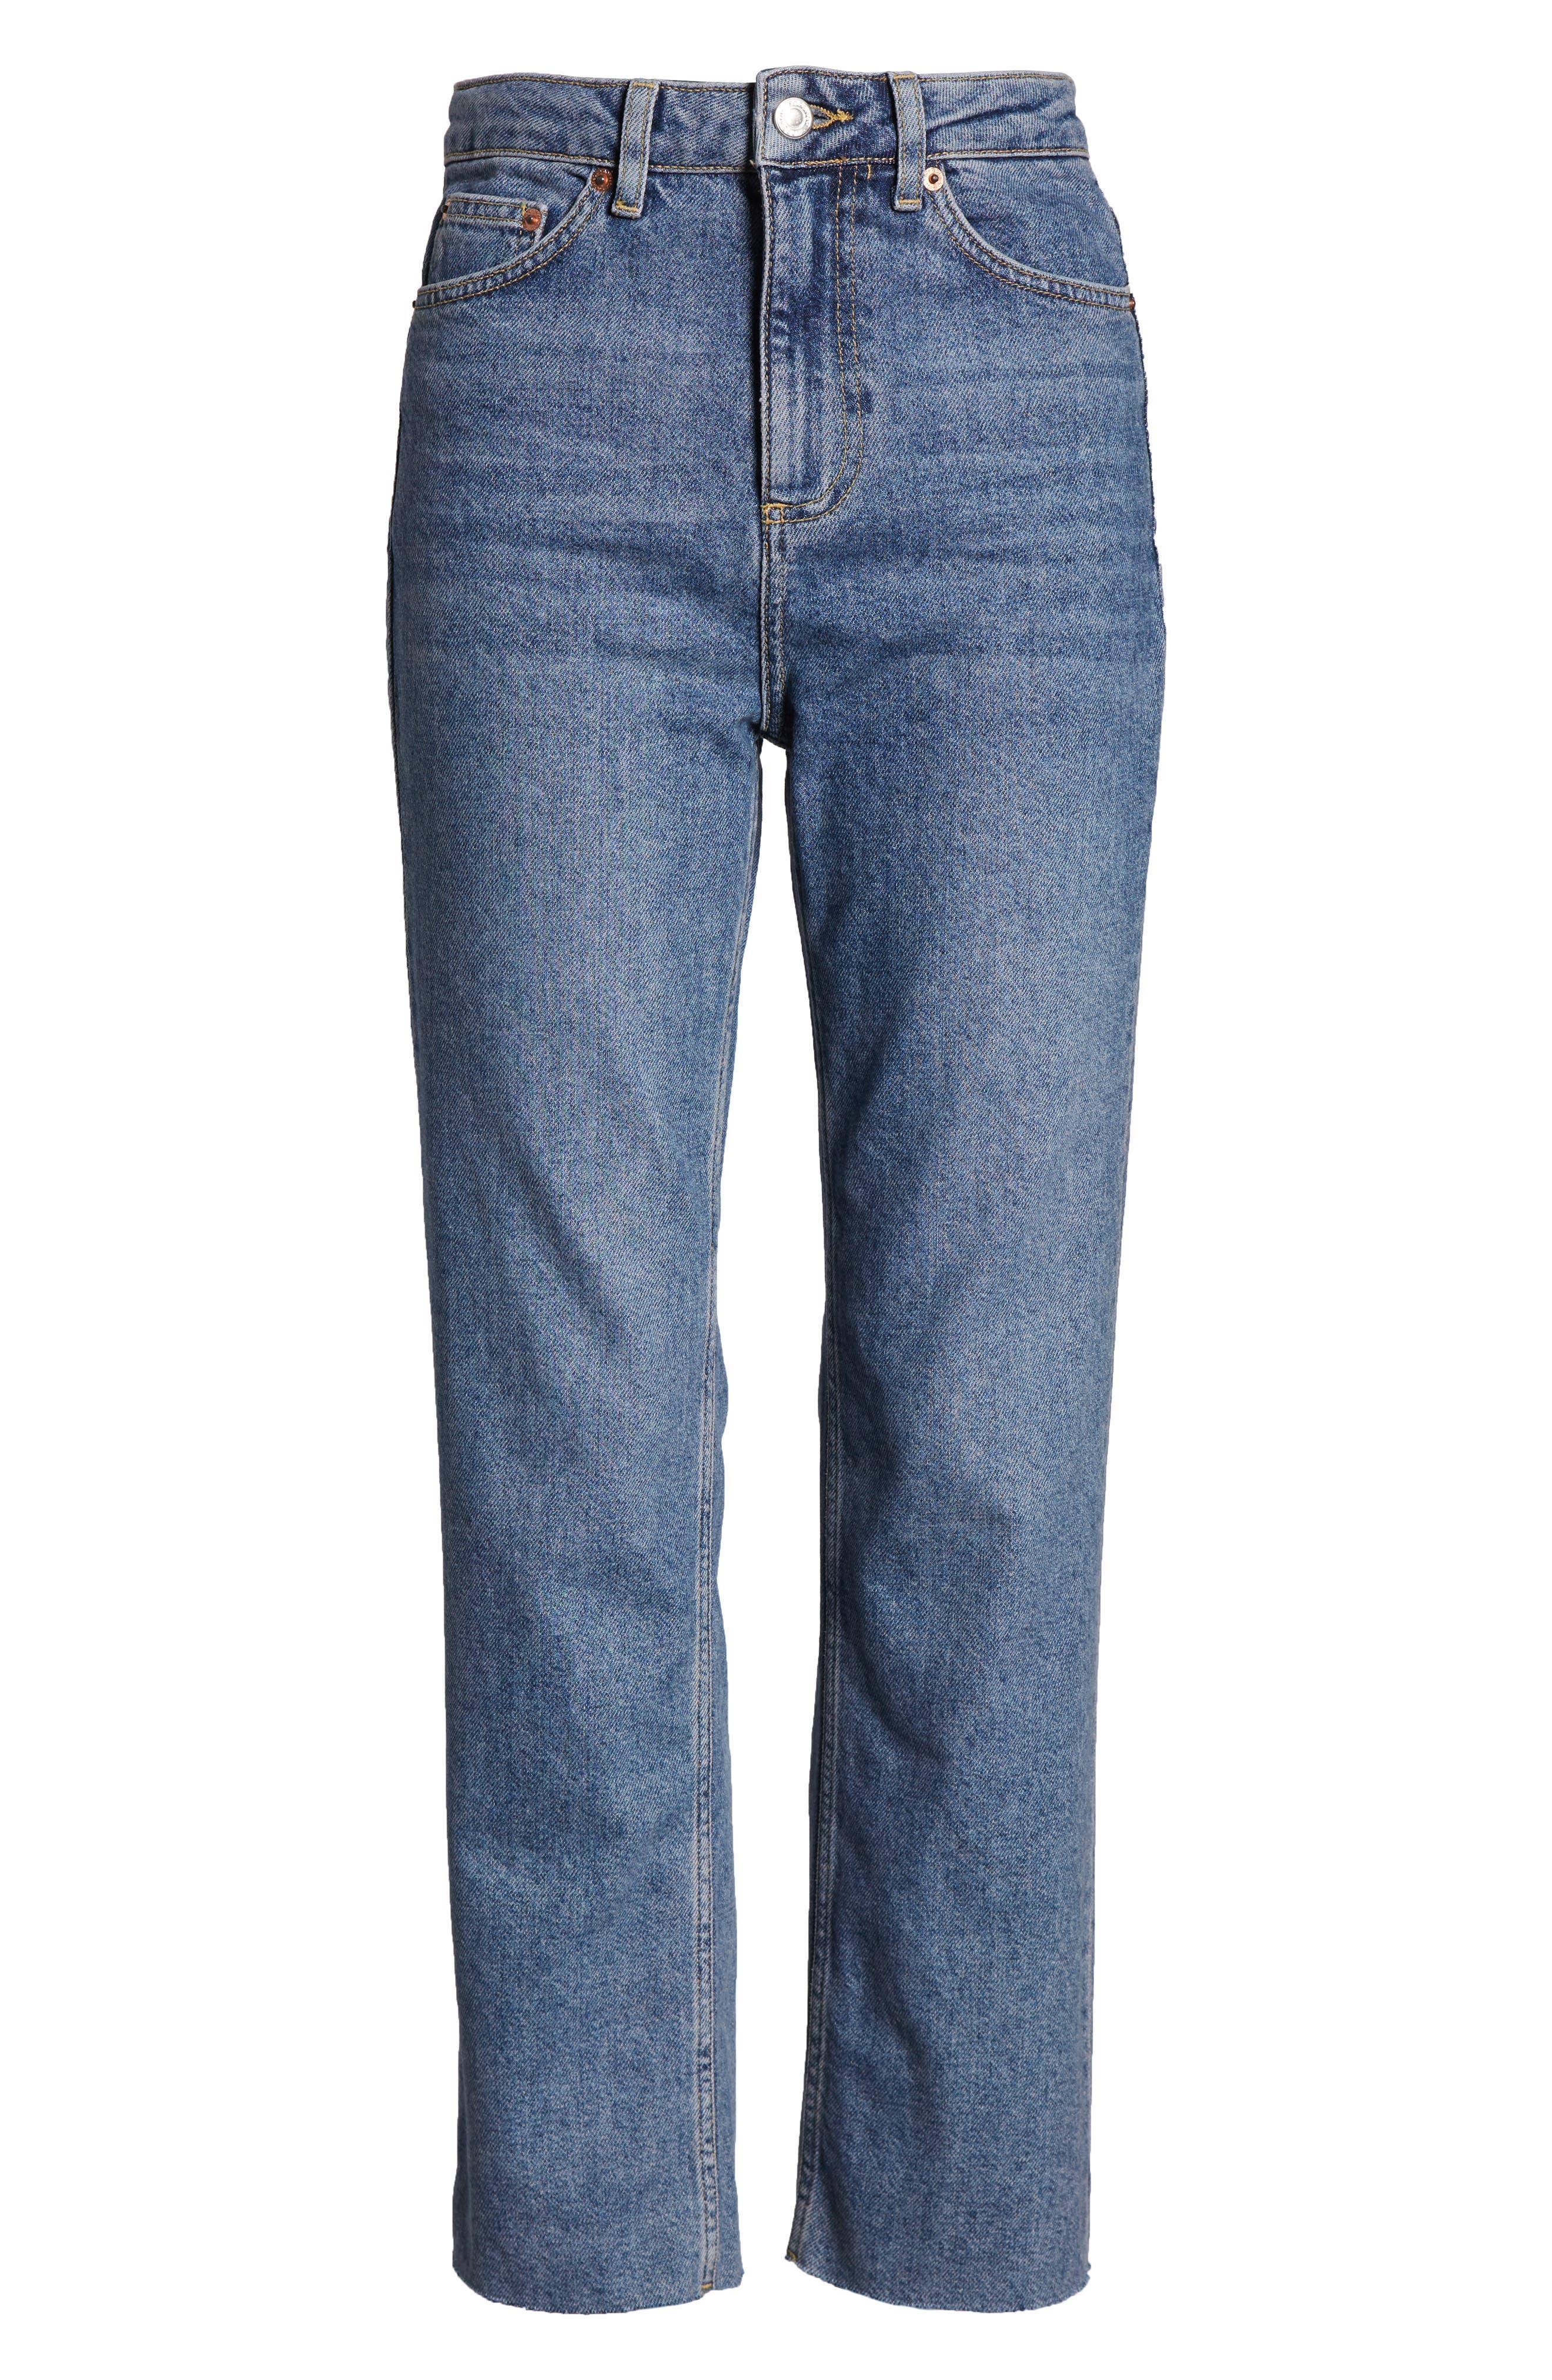 TOPSHOP, Raw Hem Straight Leg Jeans, Alternate thumbnail 7, color, MID BLUE